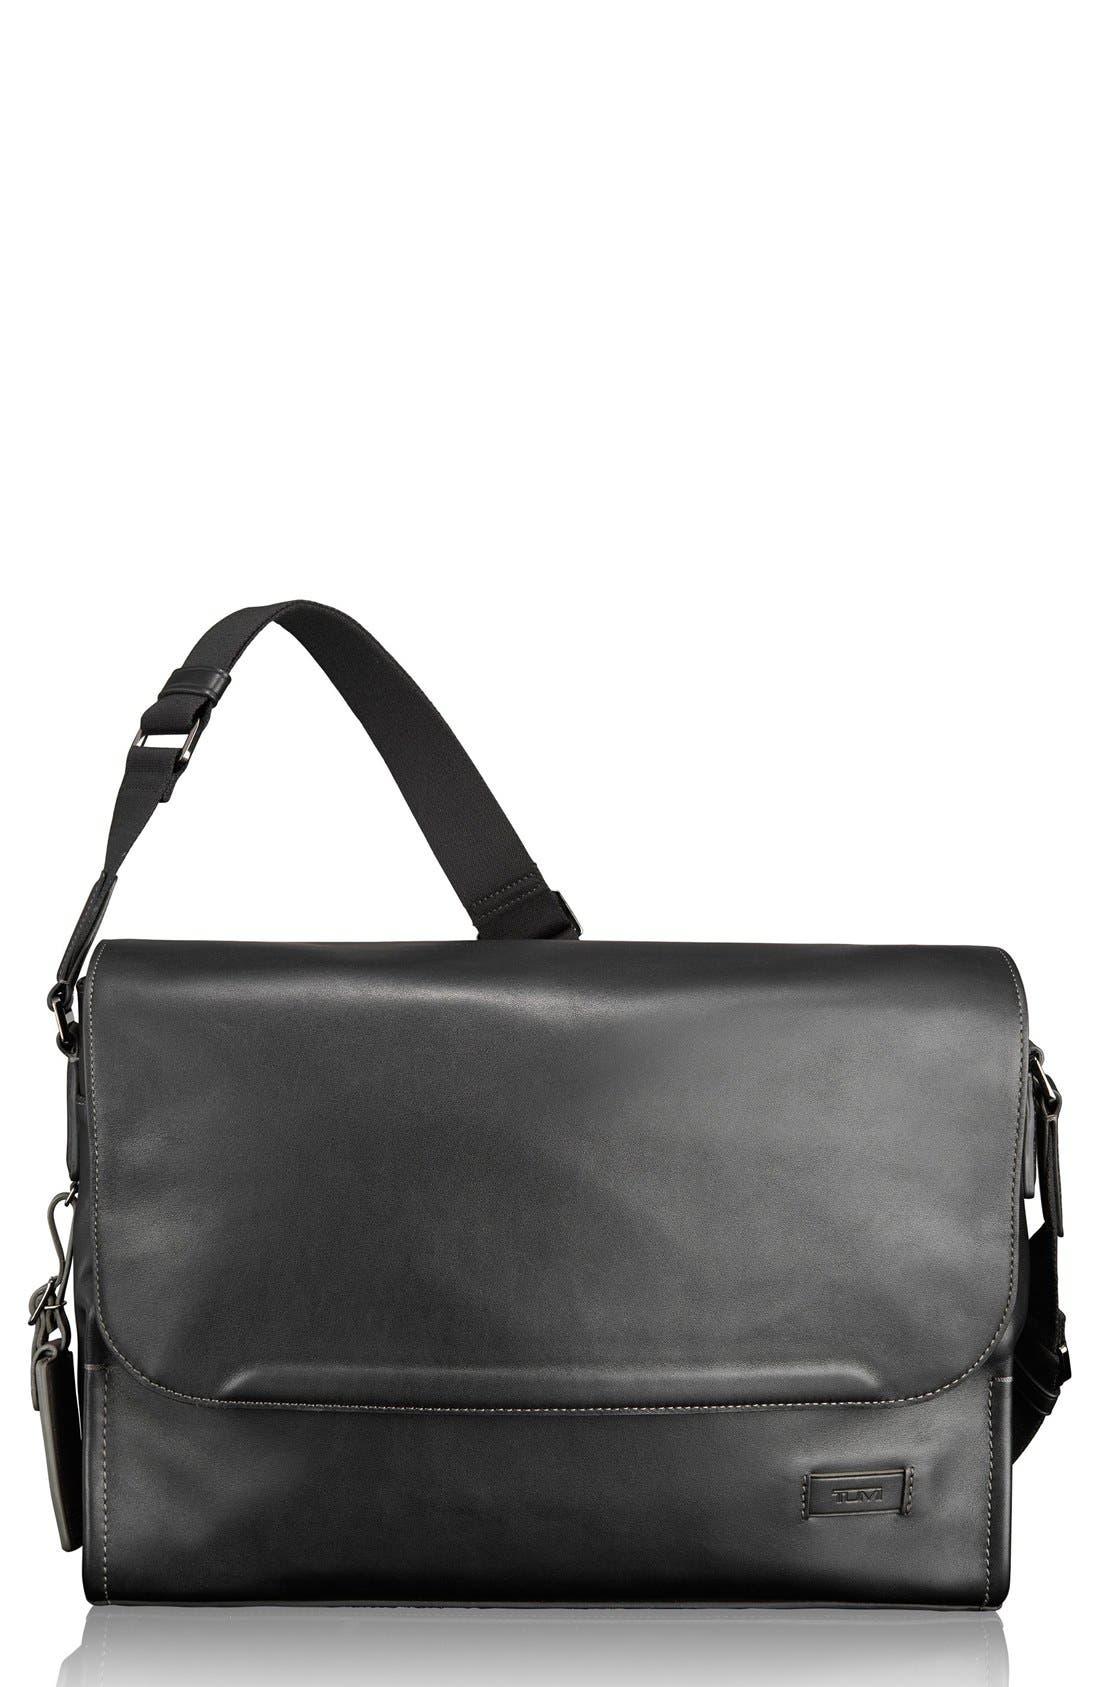 Main Image - Tumi 'Harrison - Mathews' Messenger Bag